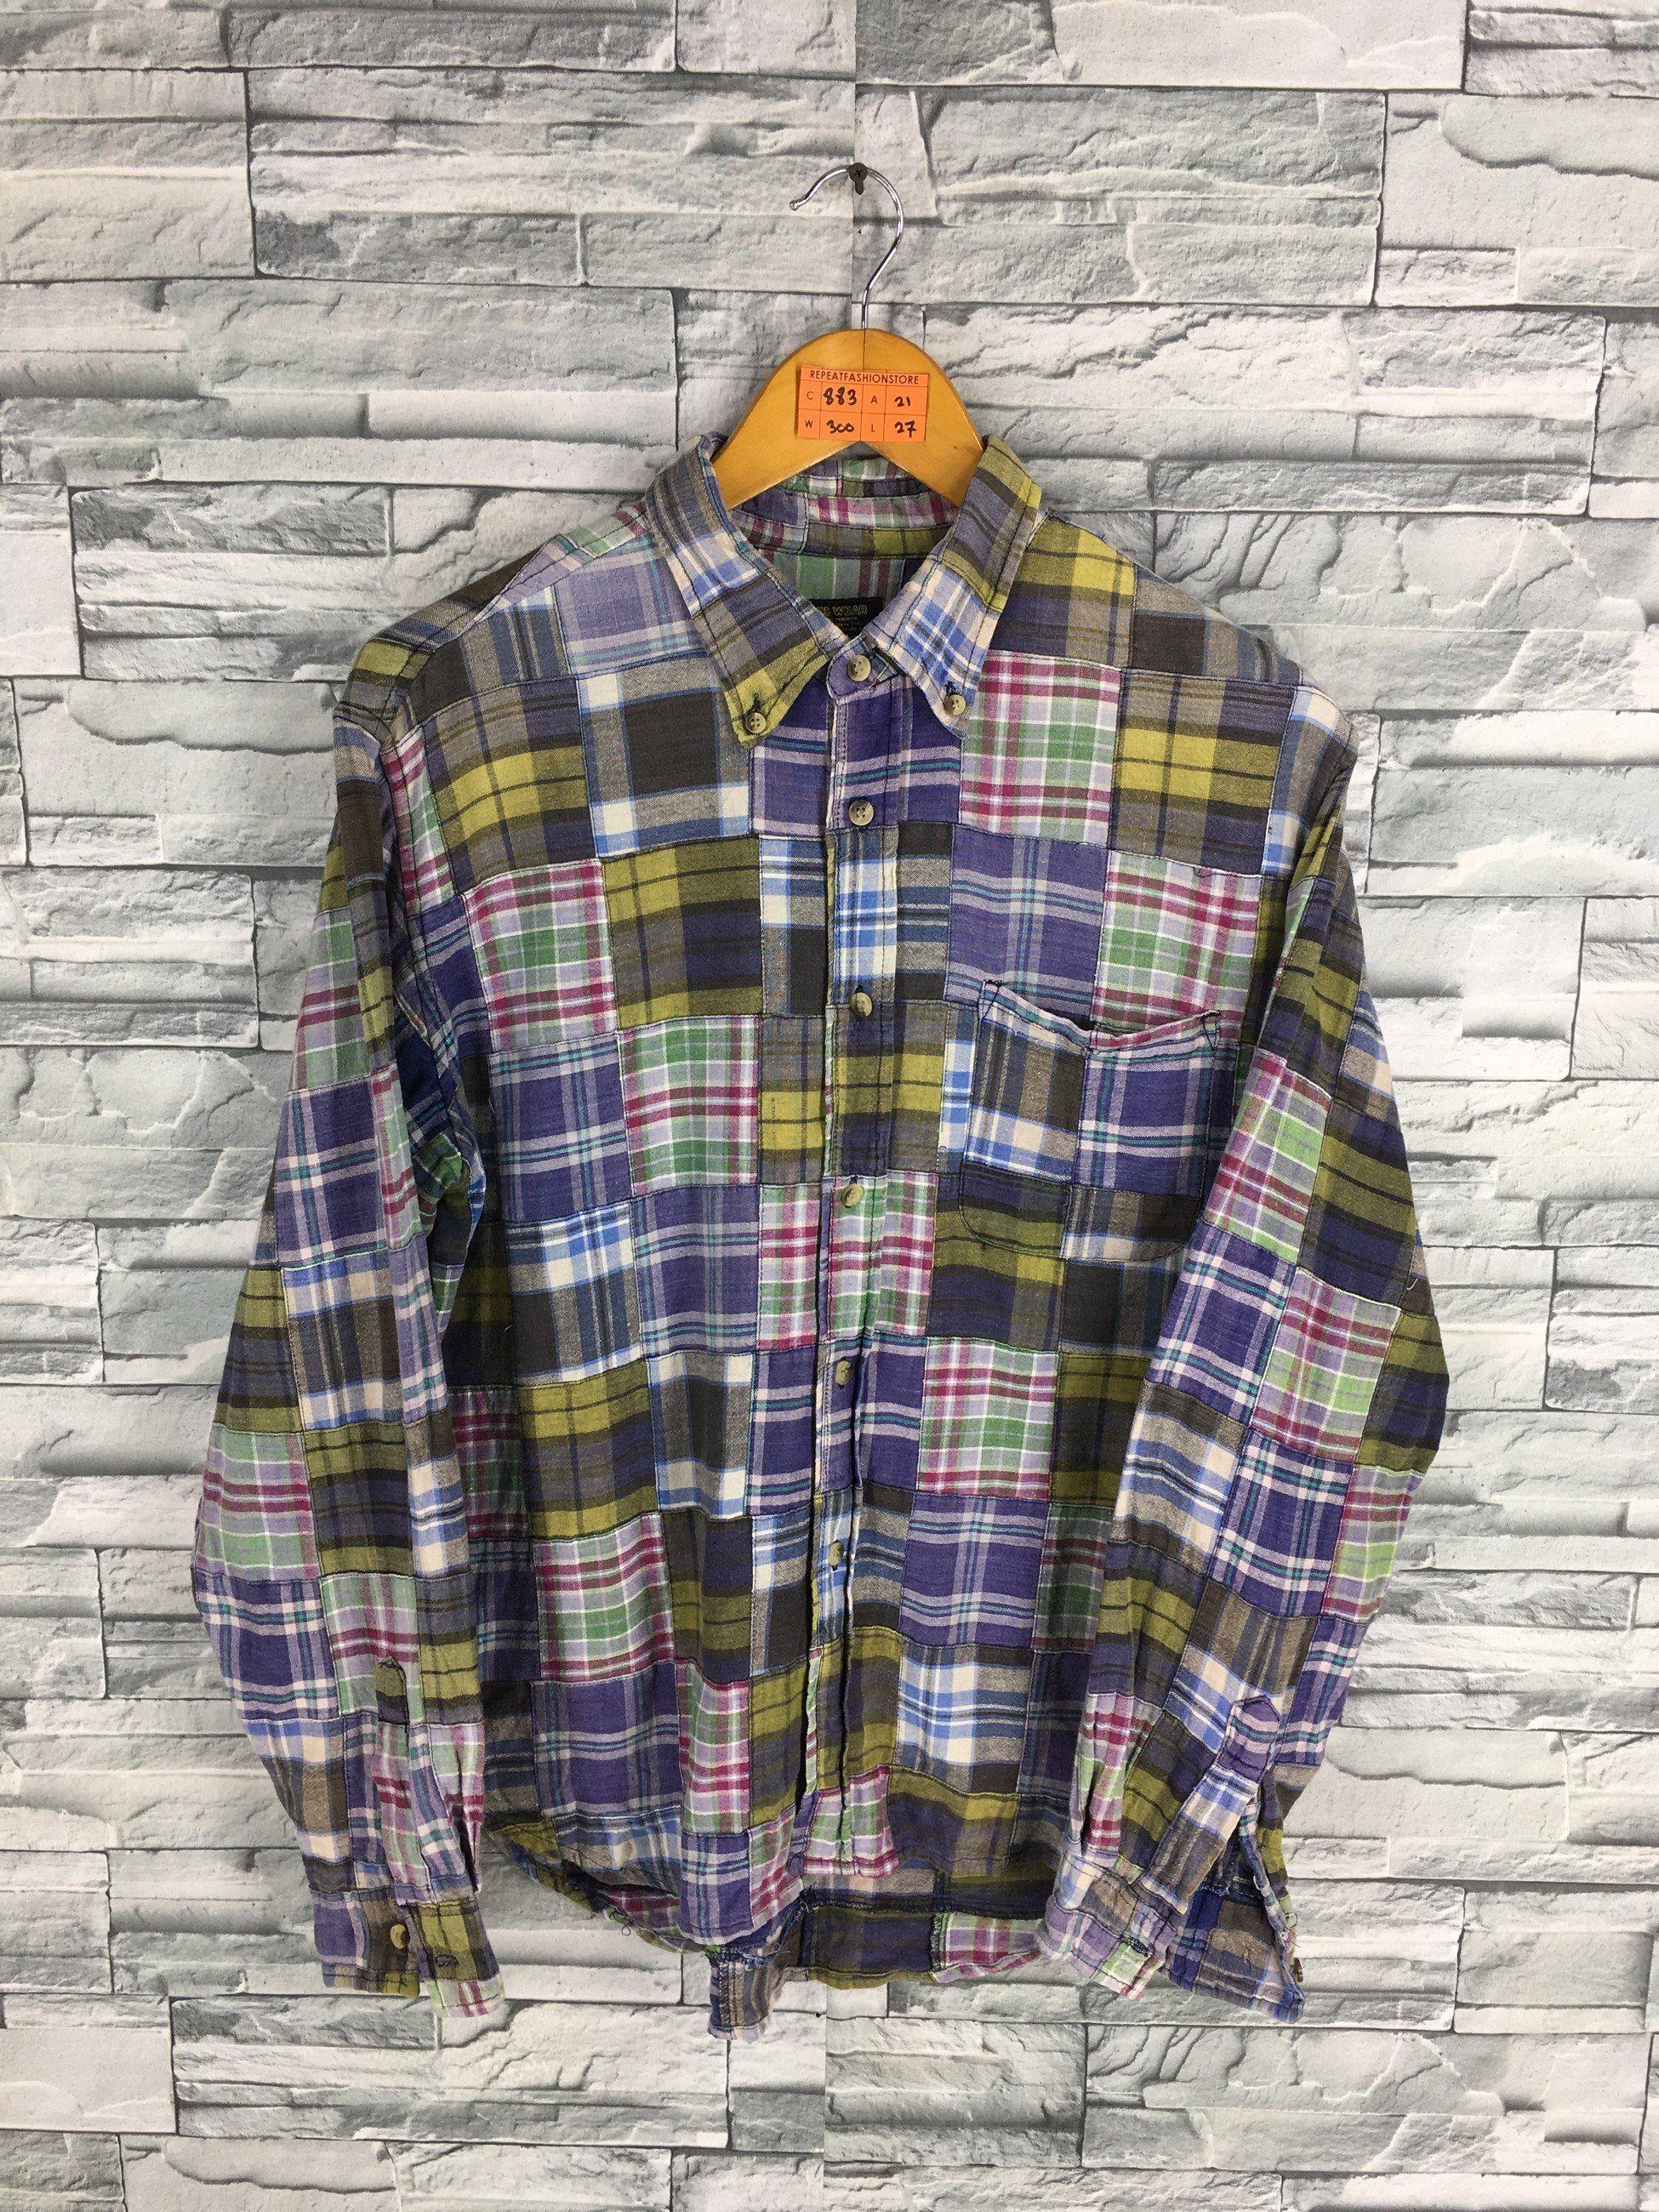 a33e20ffd Vintage 90s Patchwork Shirt Large Patchwork Flannel Checkered Tartan Shirt  Rebuild Flannel Patchwork Buttondown Multicolor Western Size L by ...